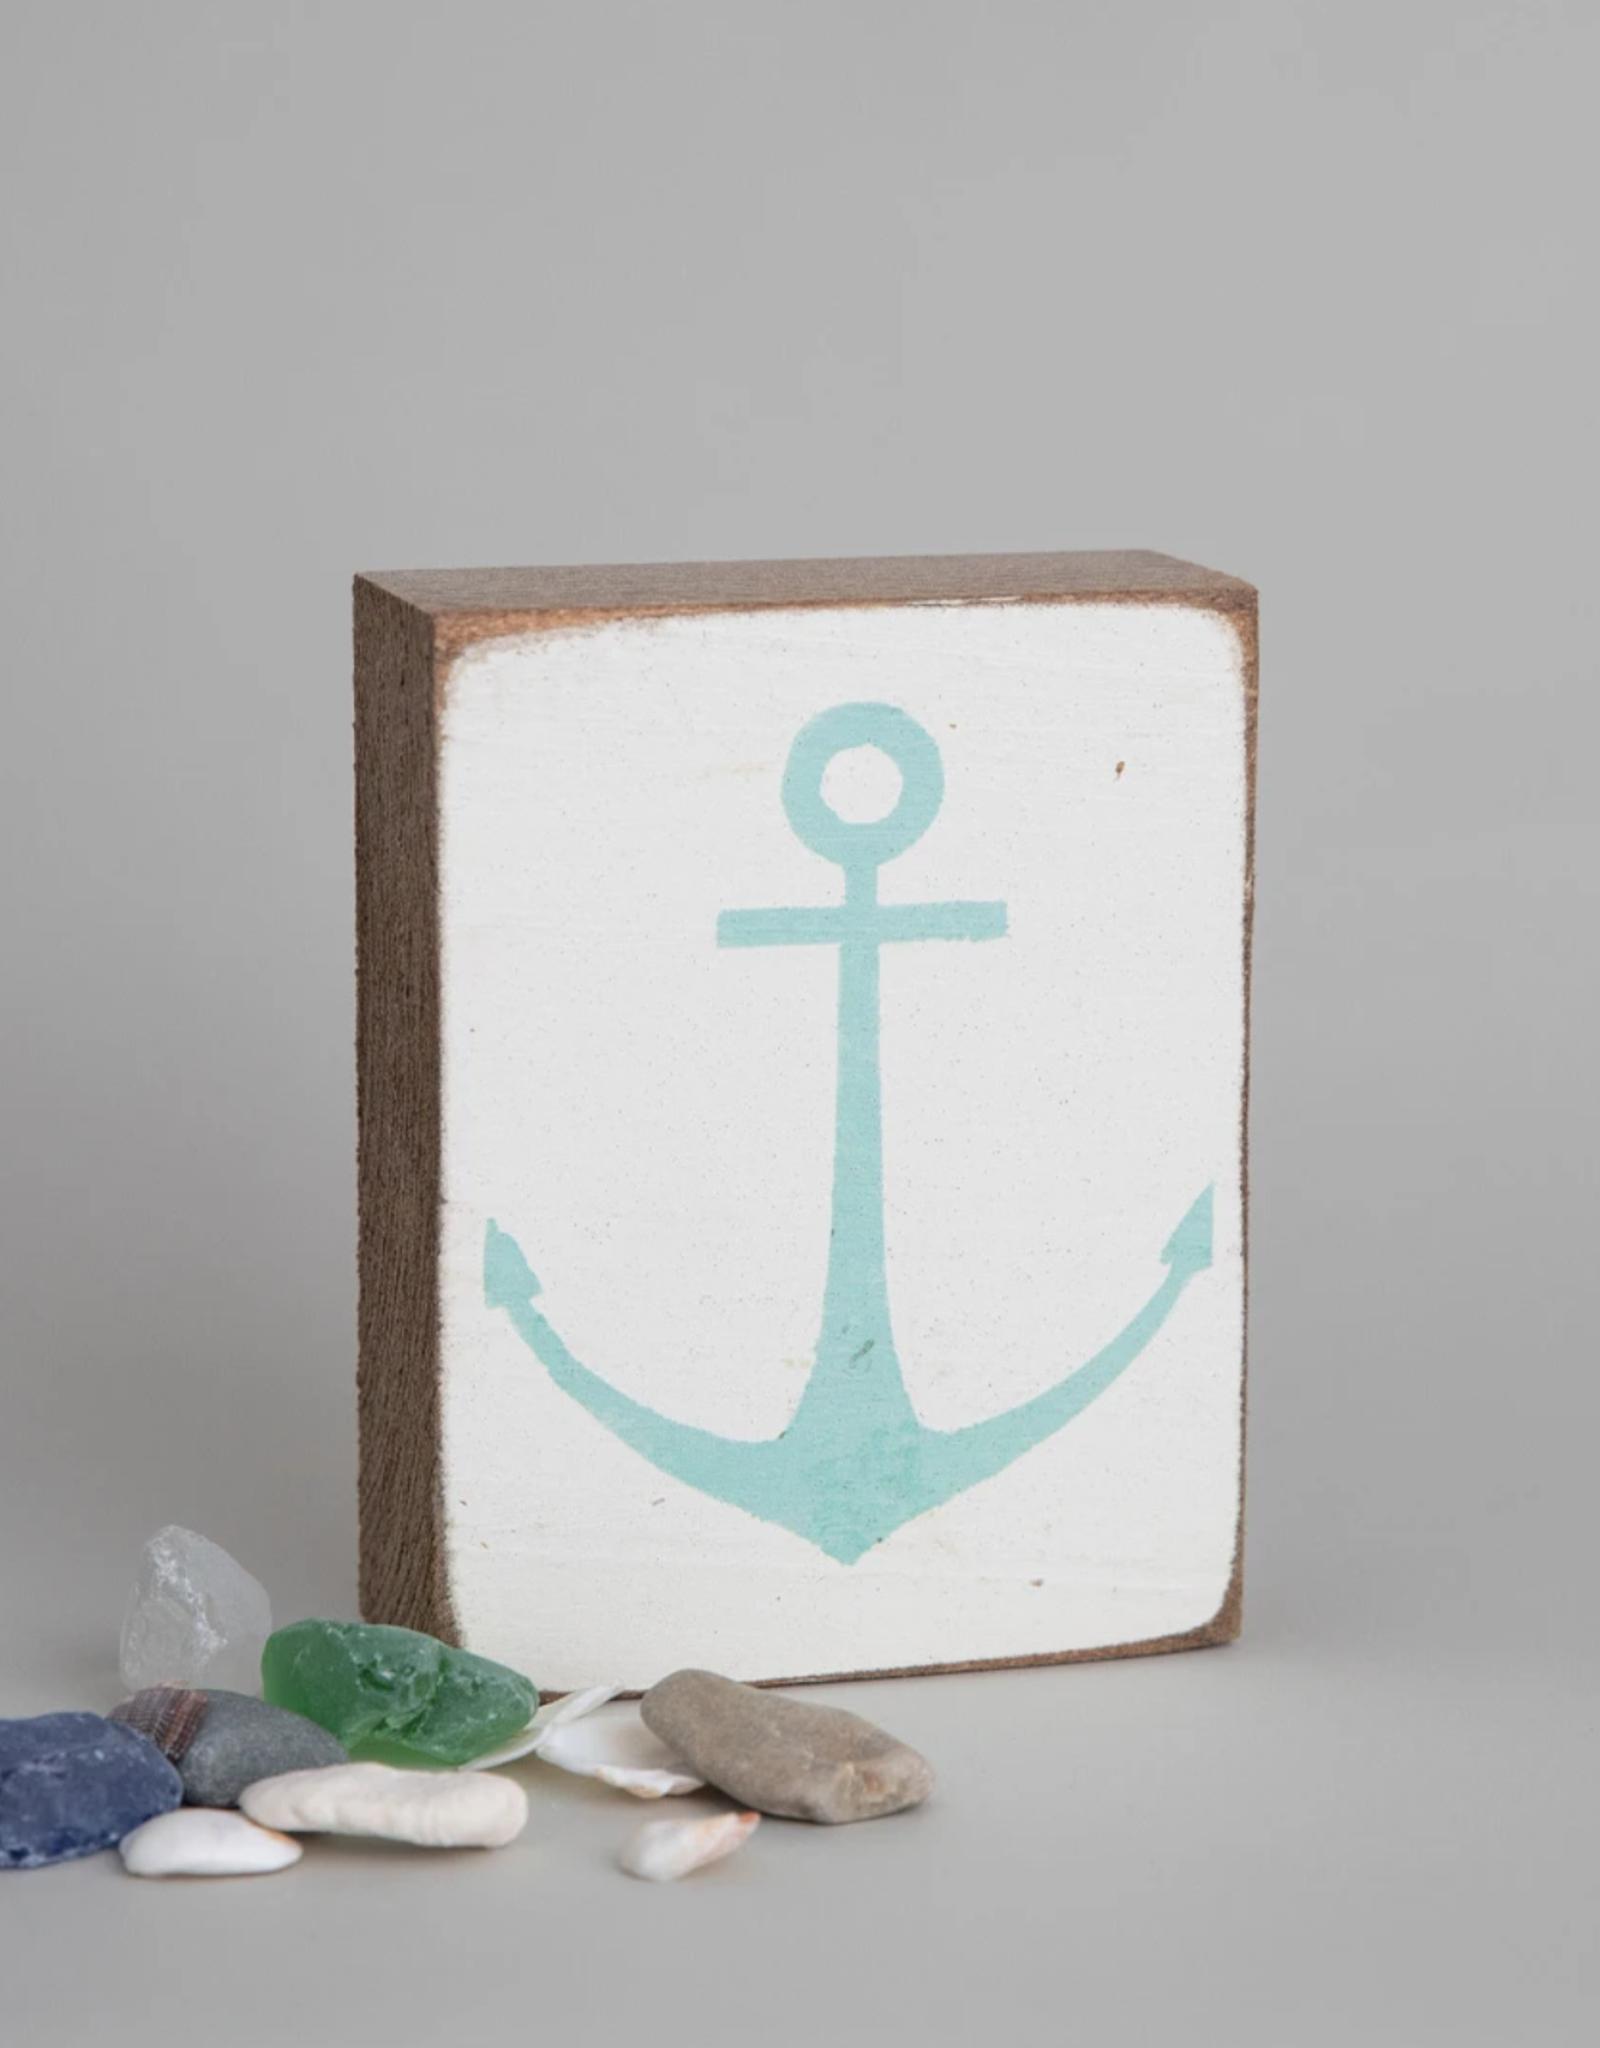 Rustic Marlin Rustic Marlin - Symbol Blocks Modern Anchor - Teal